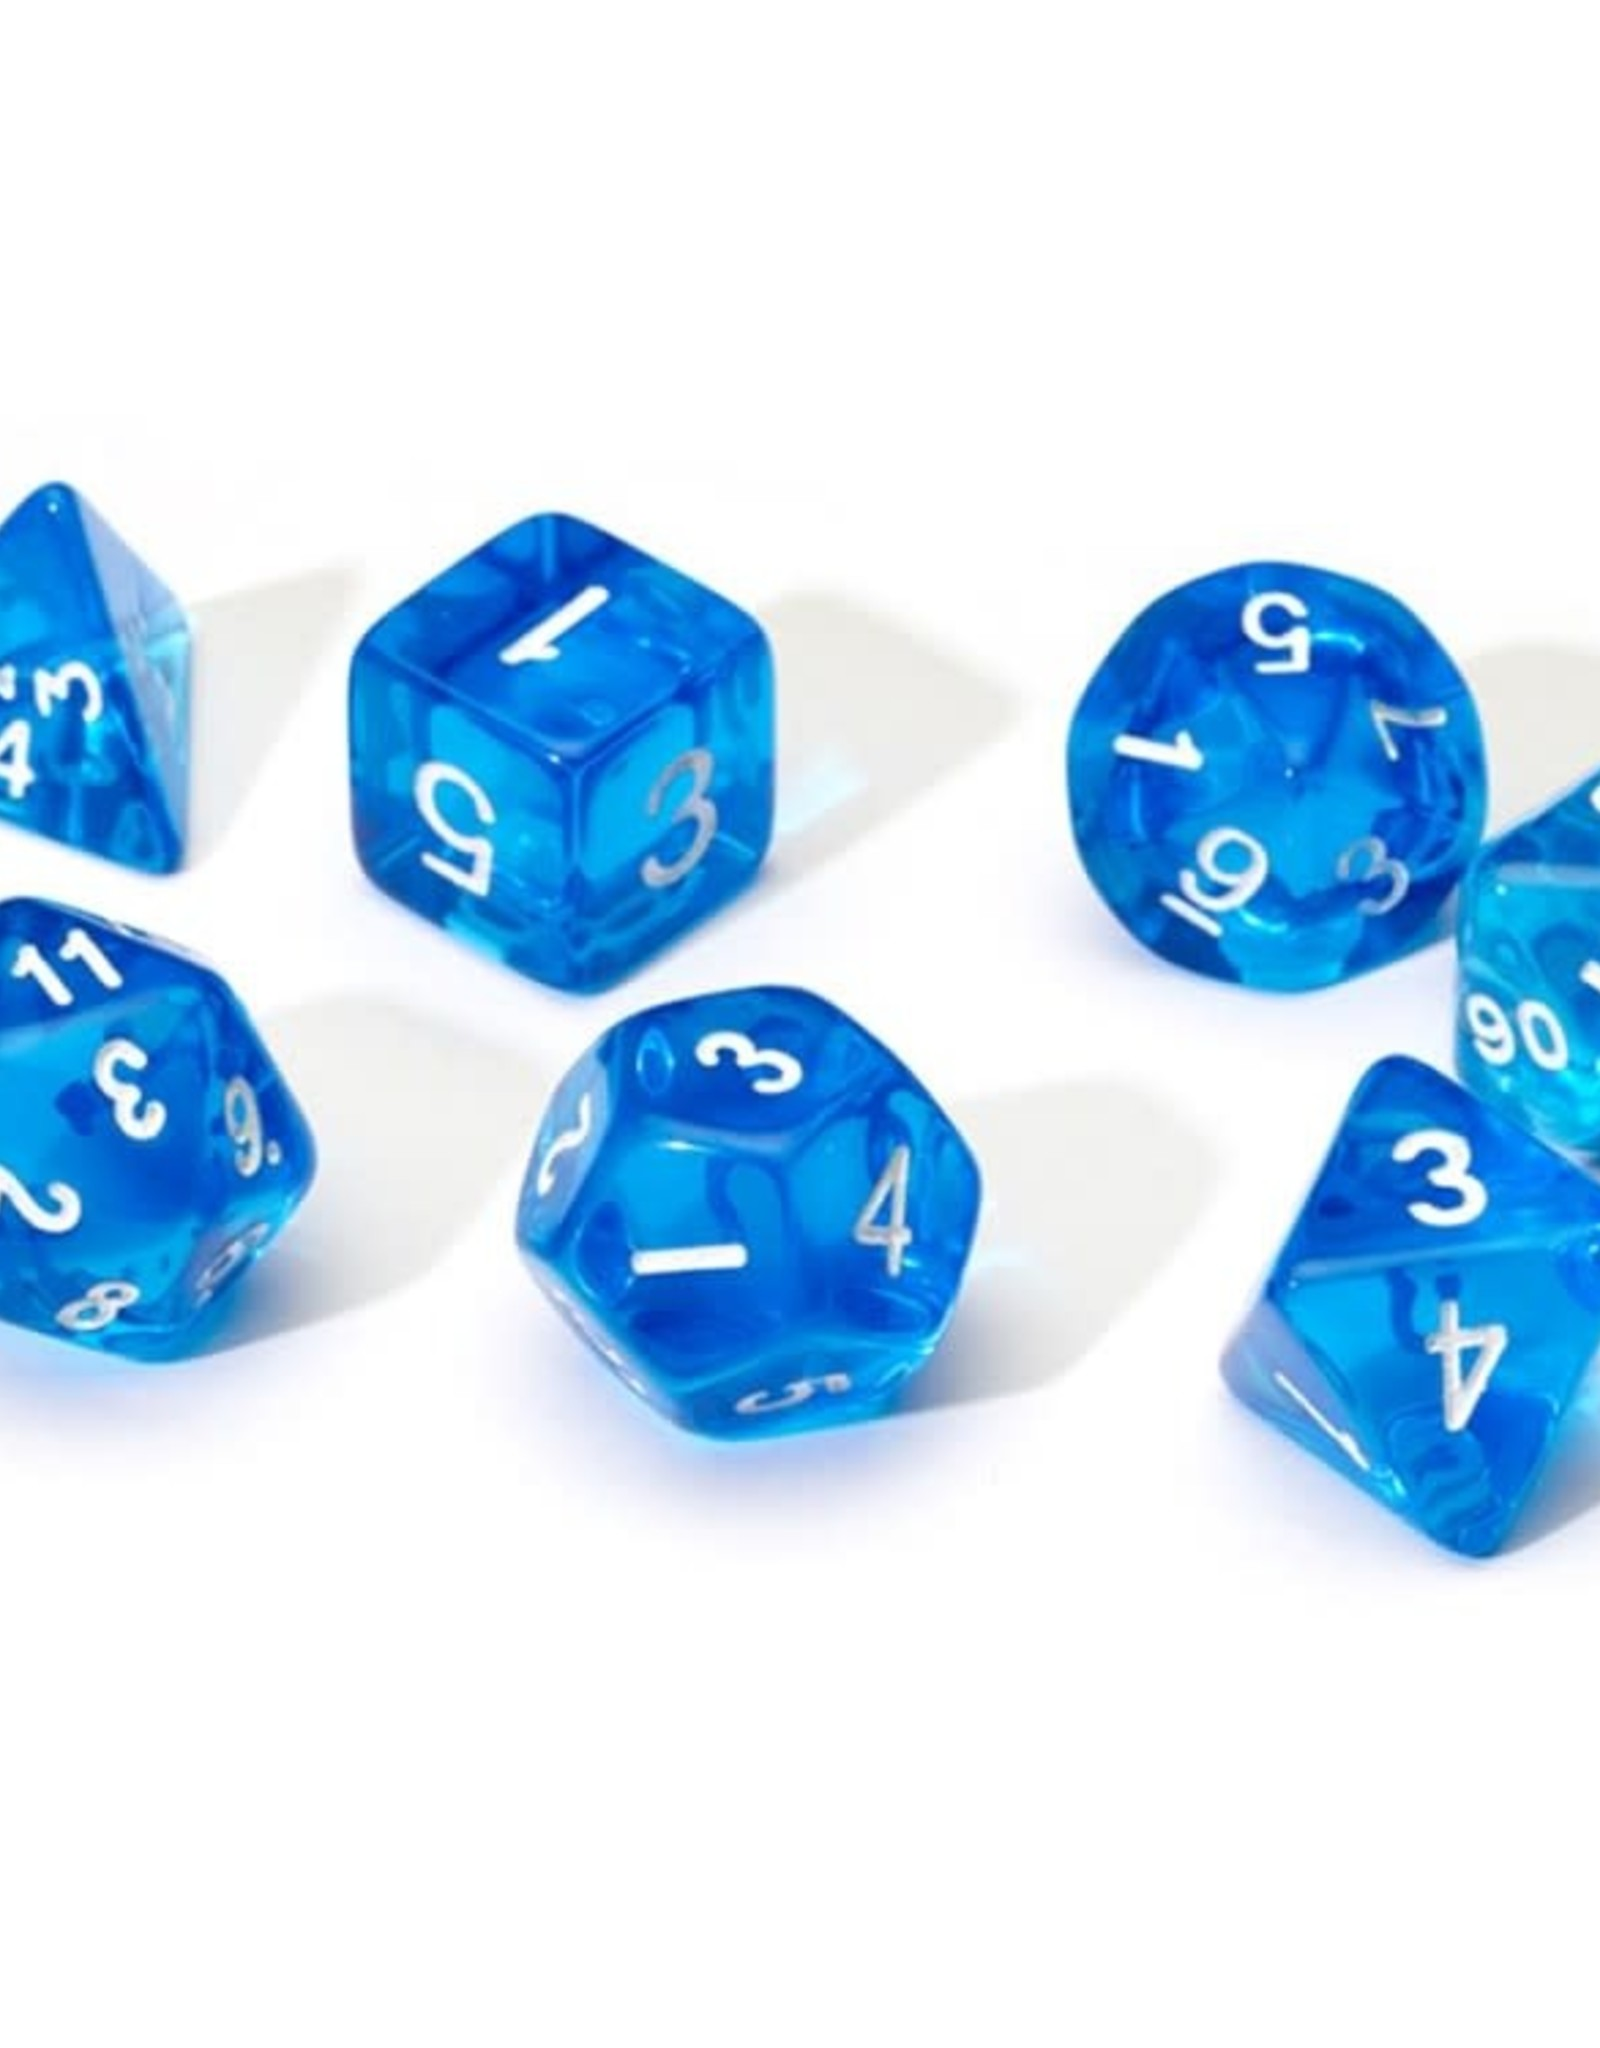 Sirius Dice 7ct Translucent Poly Dice Set Blue w/White